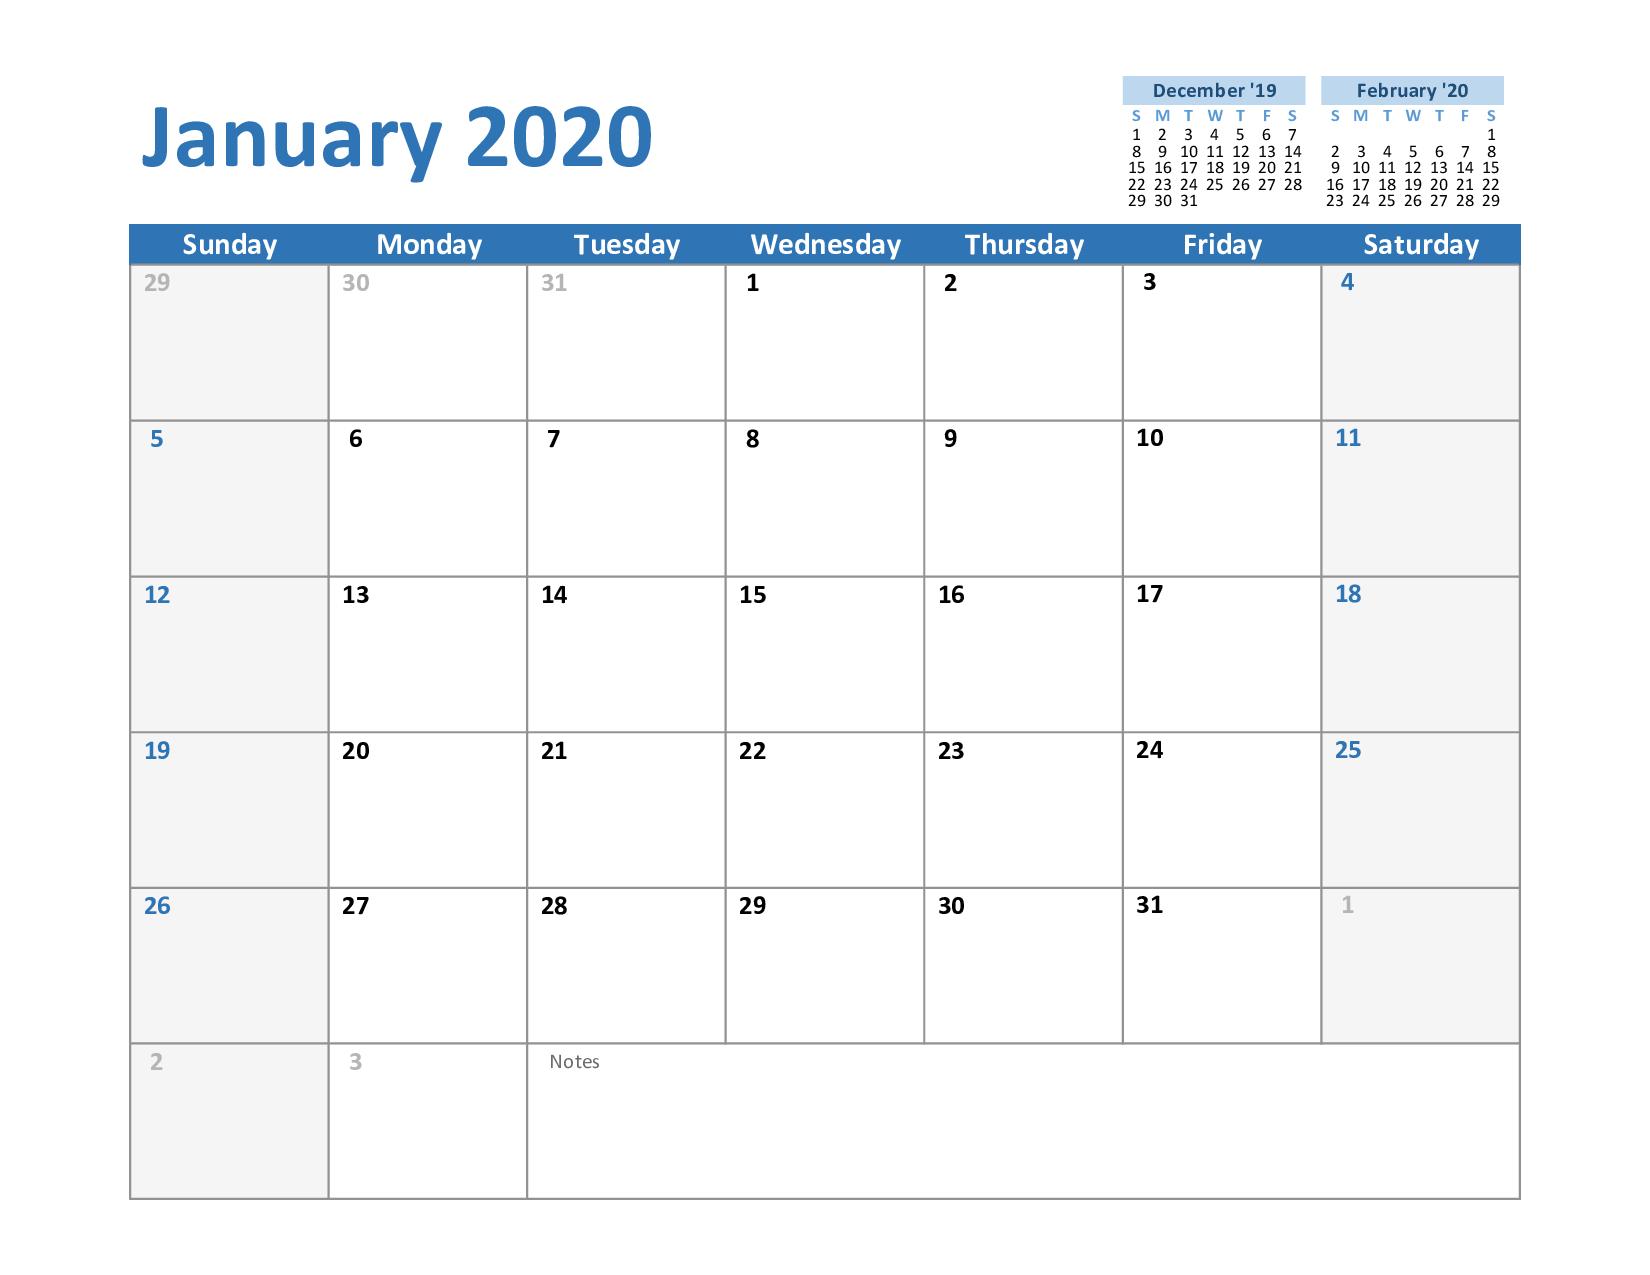 Free January Calendar 2020 Printable Template Blank In Pdf inside 2020 Printable Monthly Calendar Free Vertex